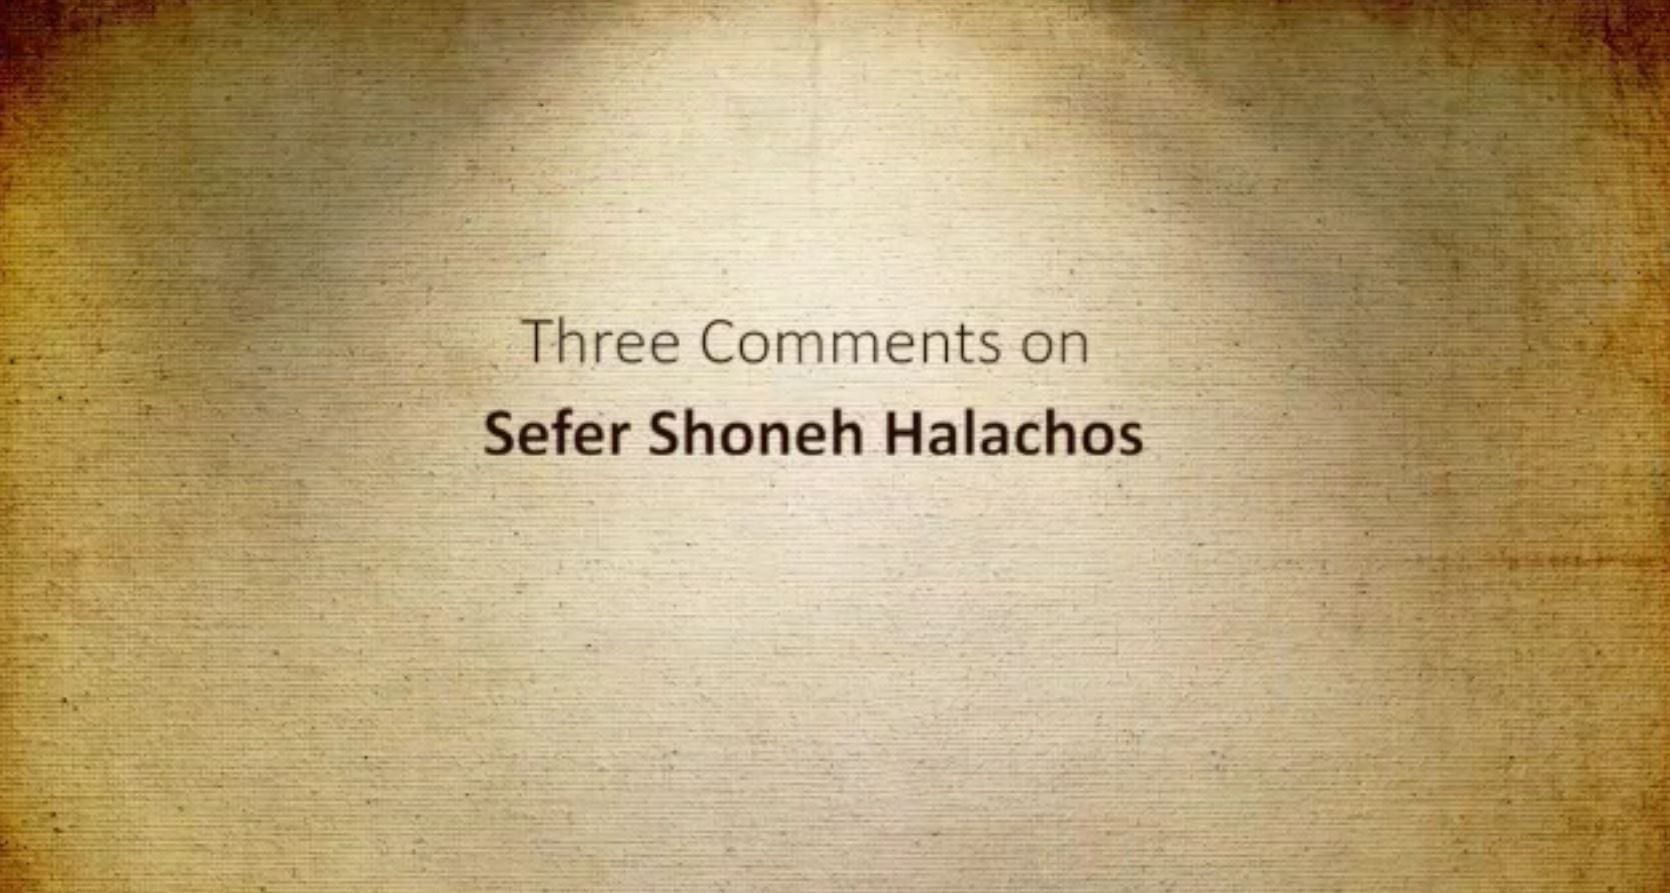 Shone Halachos